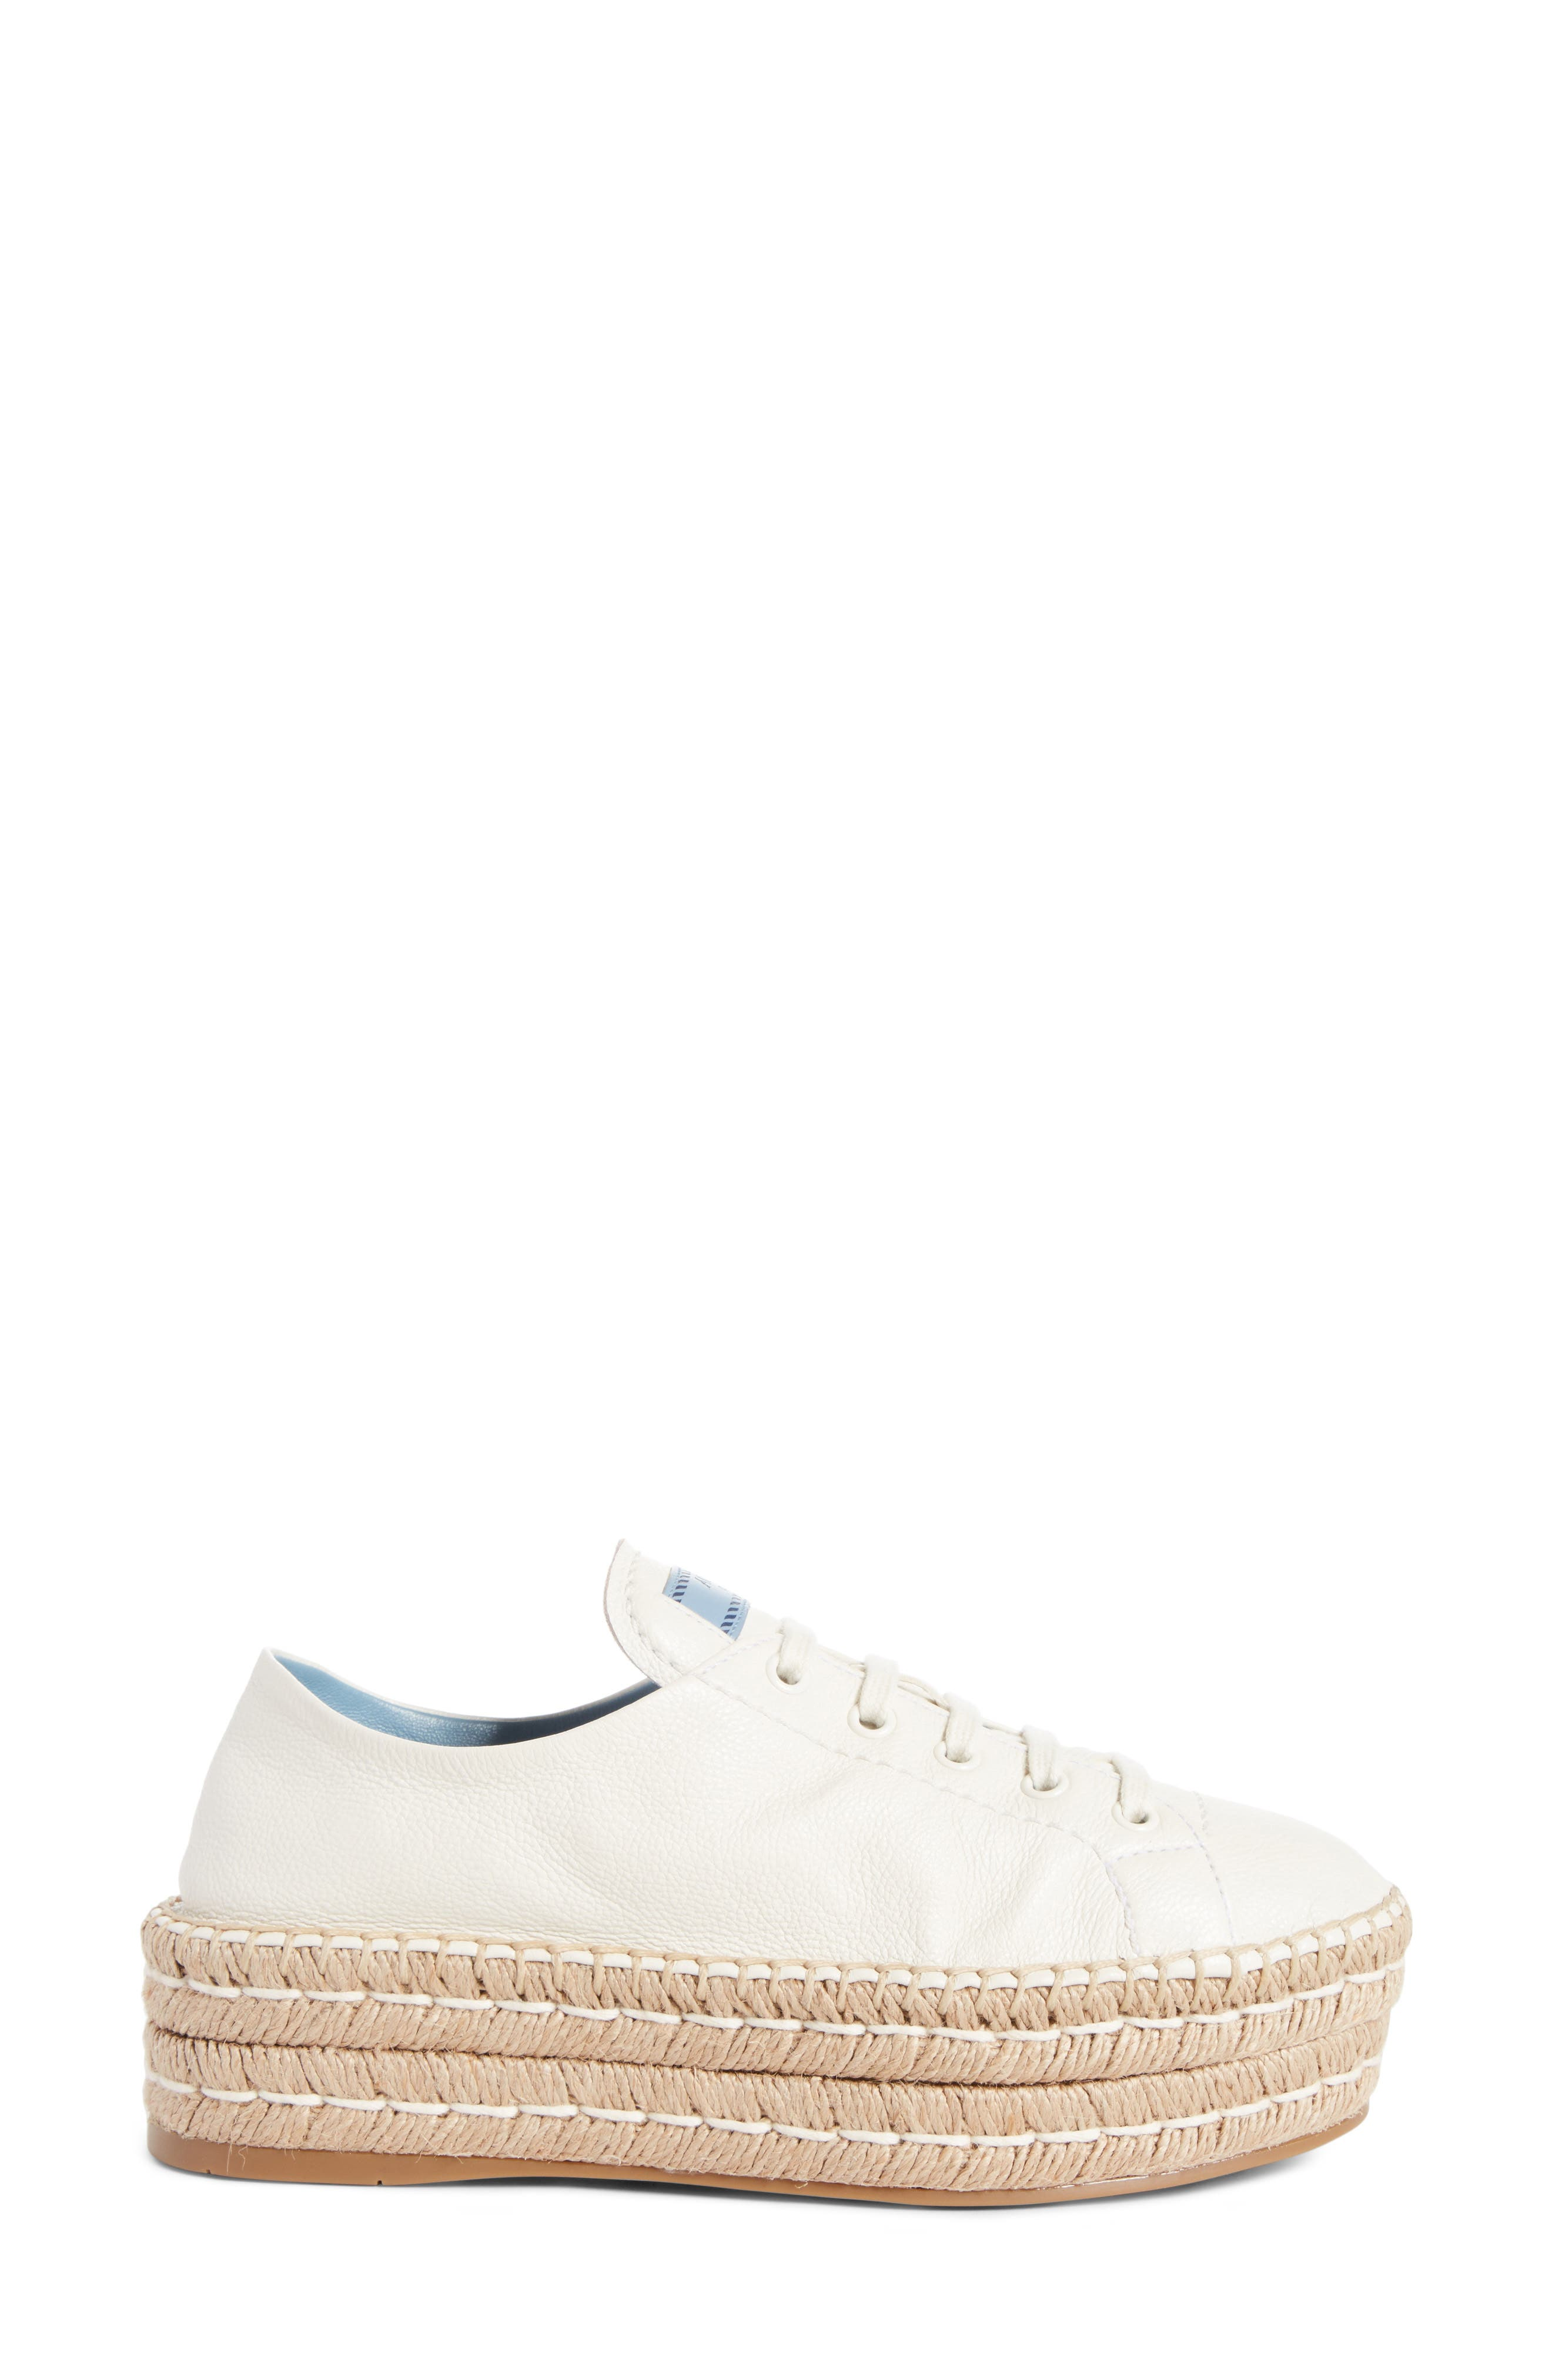 PRADA,                             Flatform Espadrille Sneaker,                             Alternate thumbnail 3, color,                             WHITE